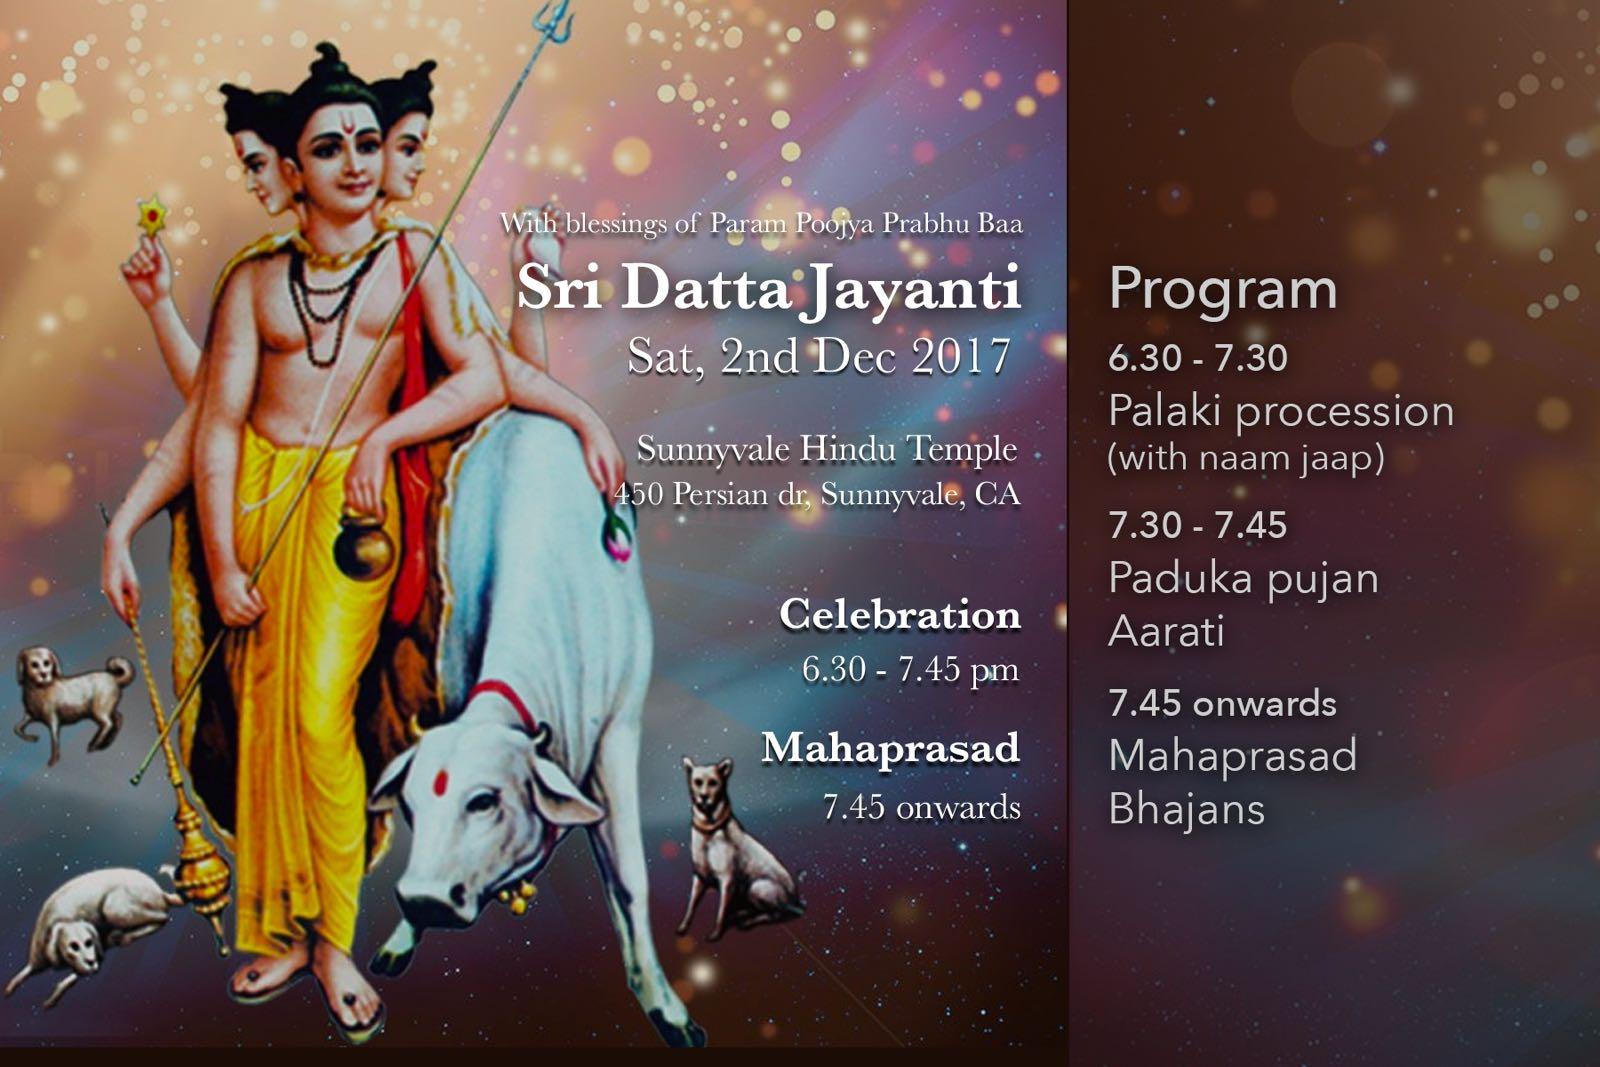 Shree Datta Jayanti Celebration